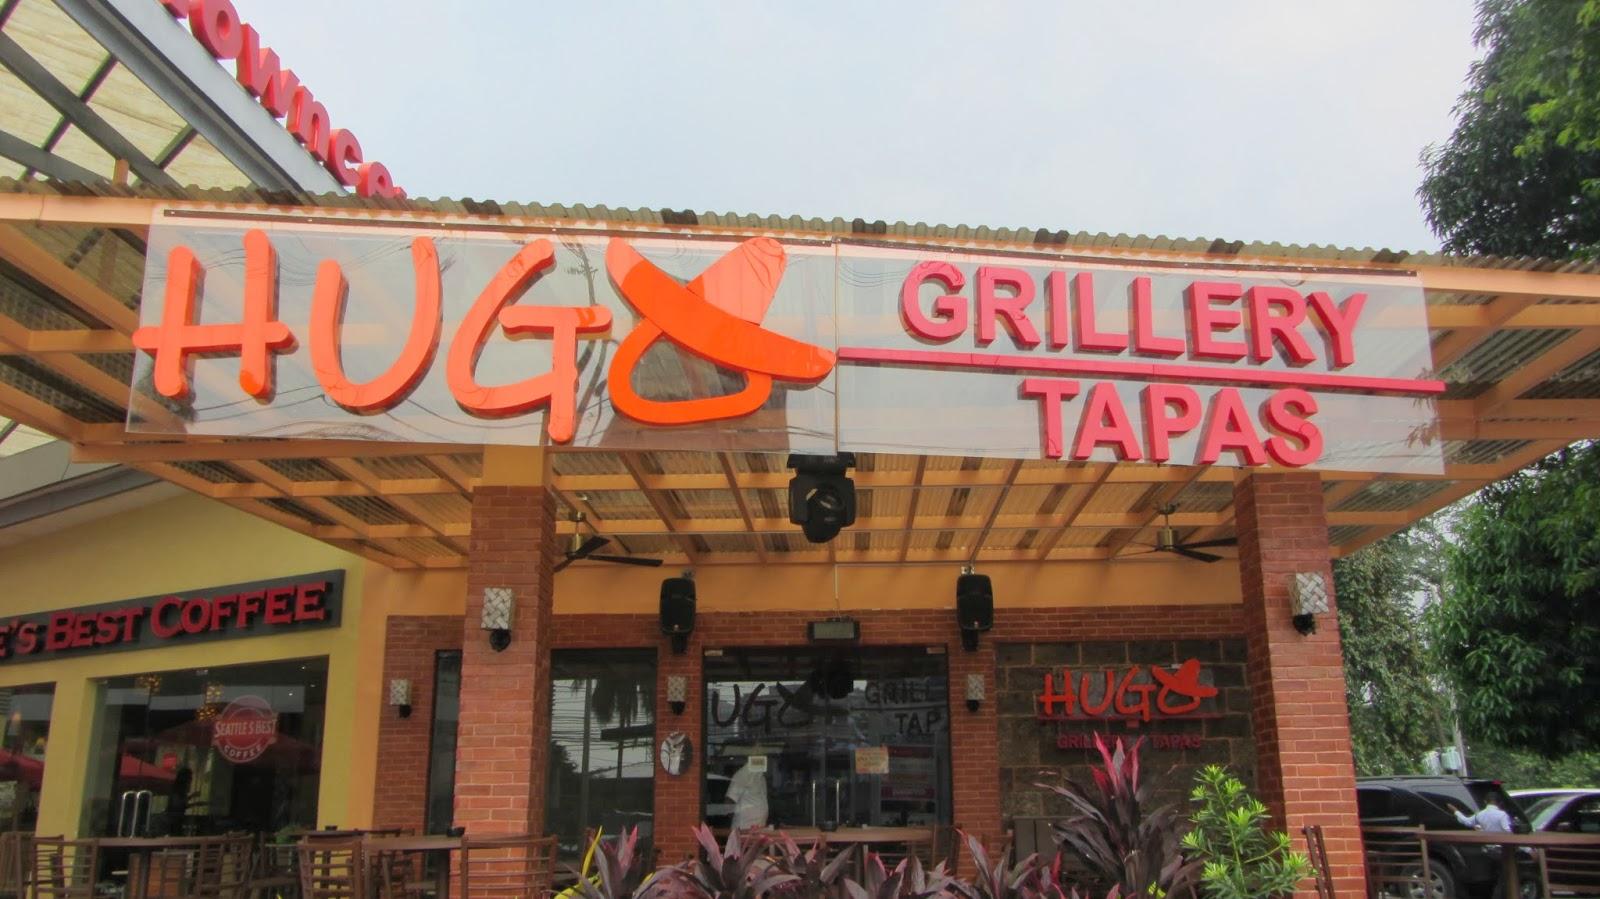 Hugo Grillery/Tapas is locatedhugo town